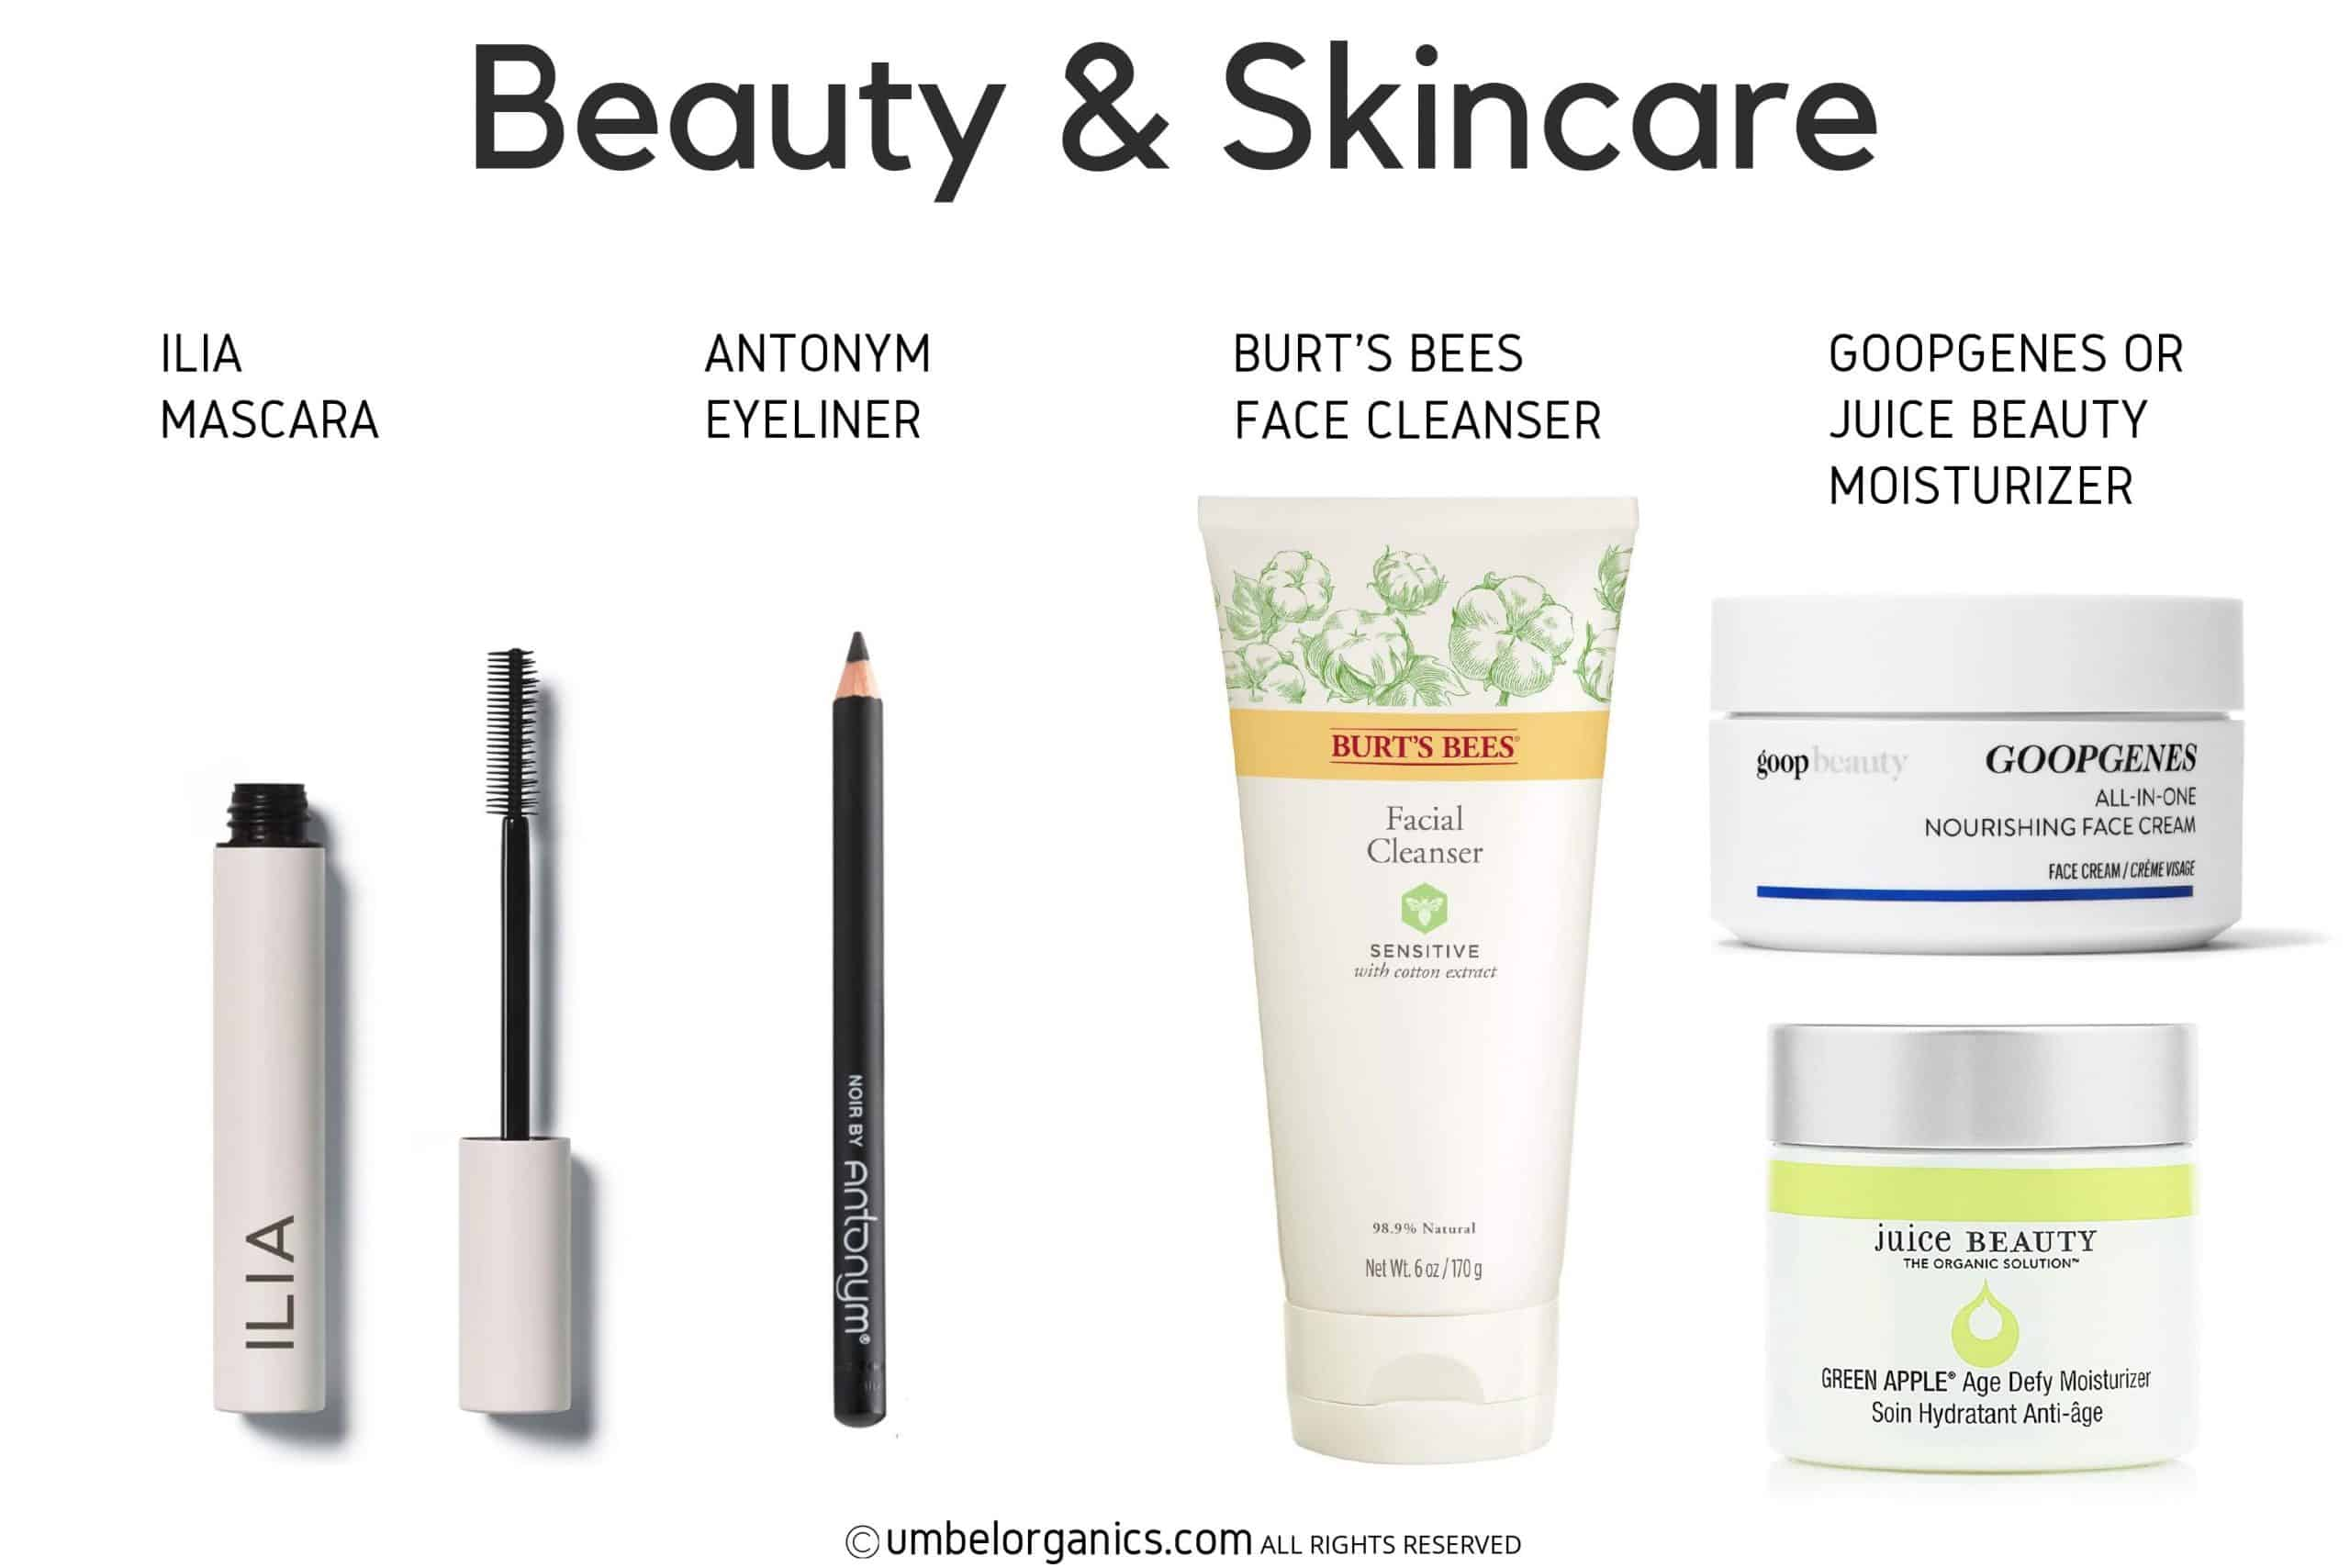 Ilia mascara, Antonym eyeliner, Burt's Bees face wash, Goopgenes Face Cream & Juice Beauty Face Moisturizer